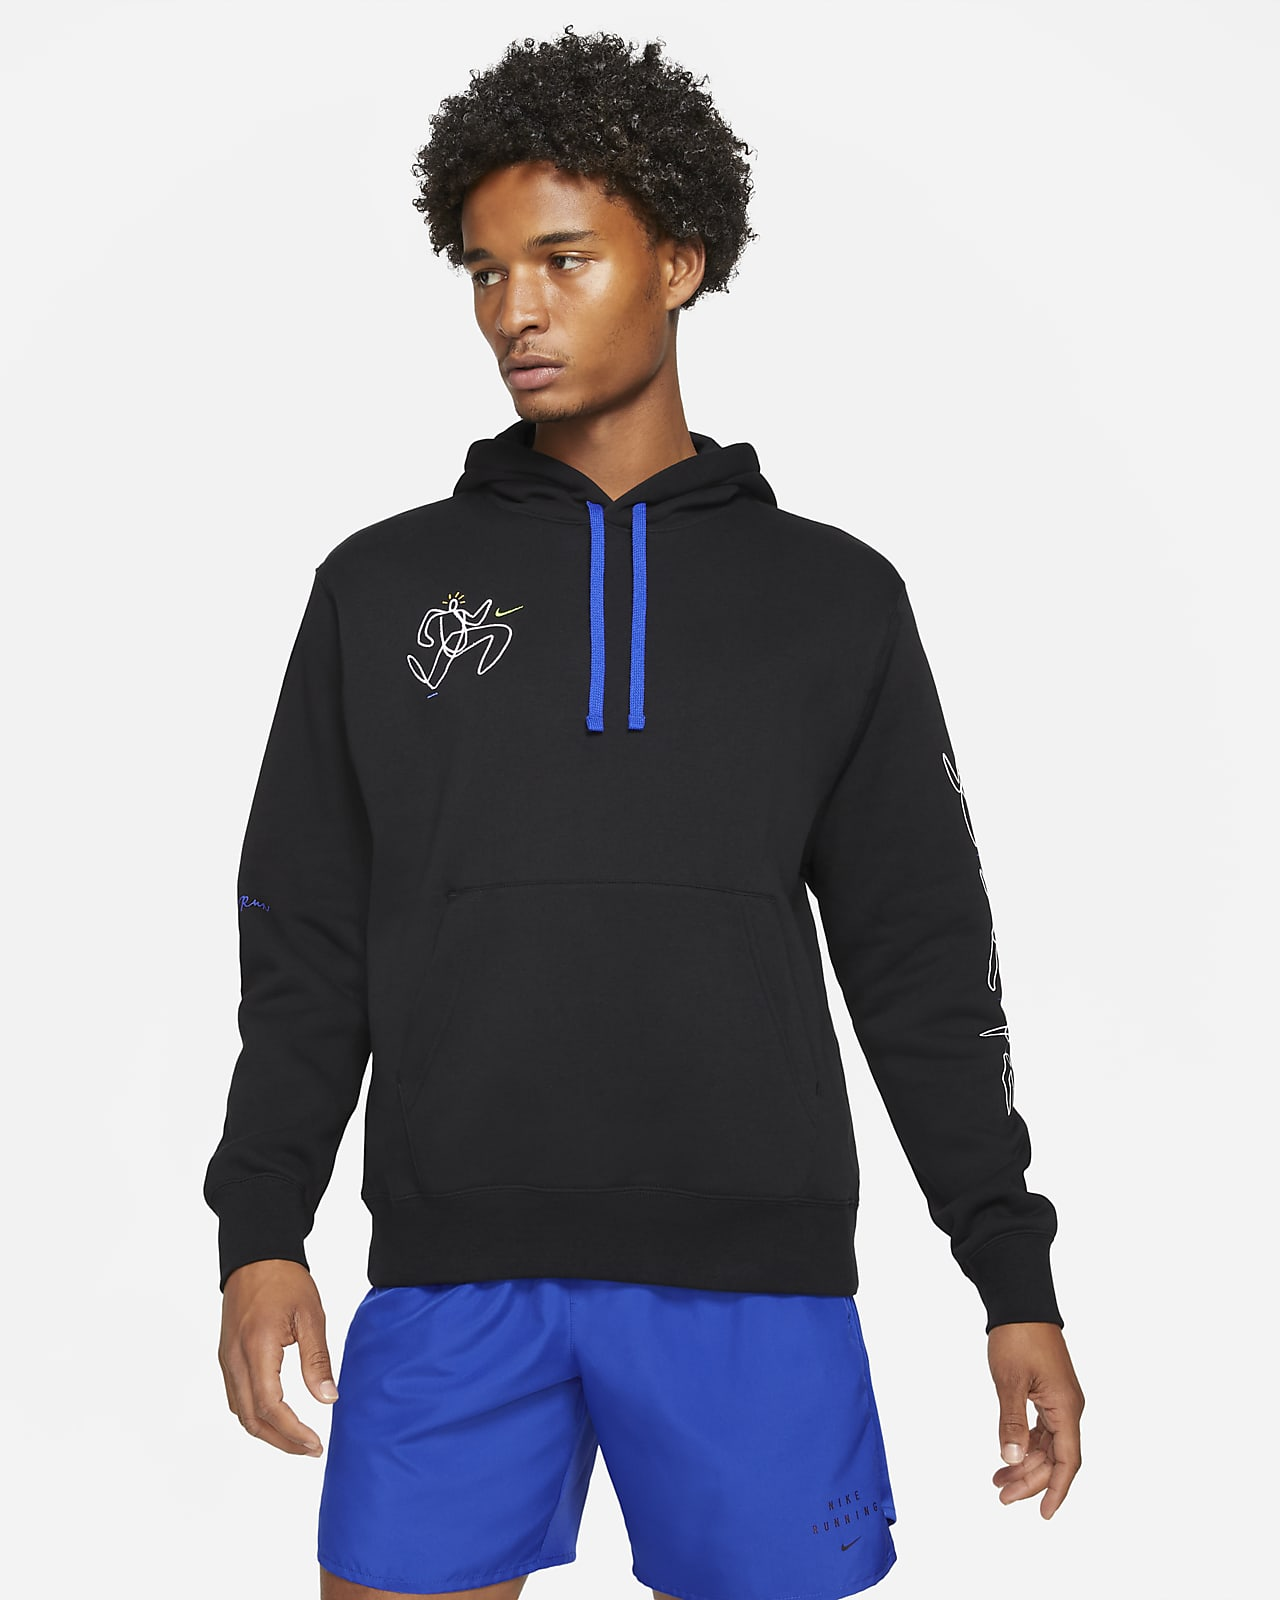 Hoodie de running em lã cardada Nike Hackney Club para homem